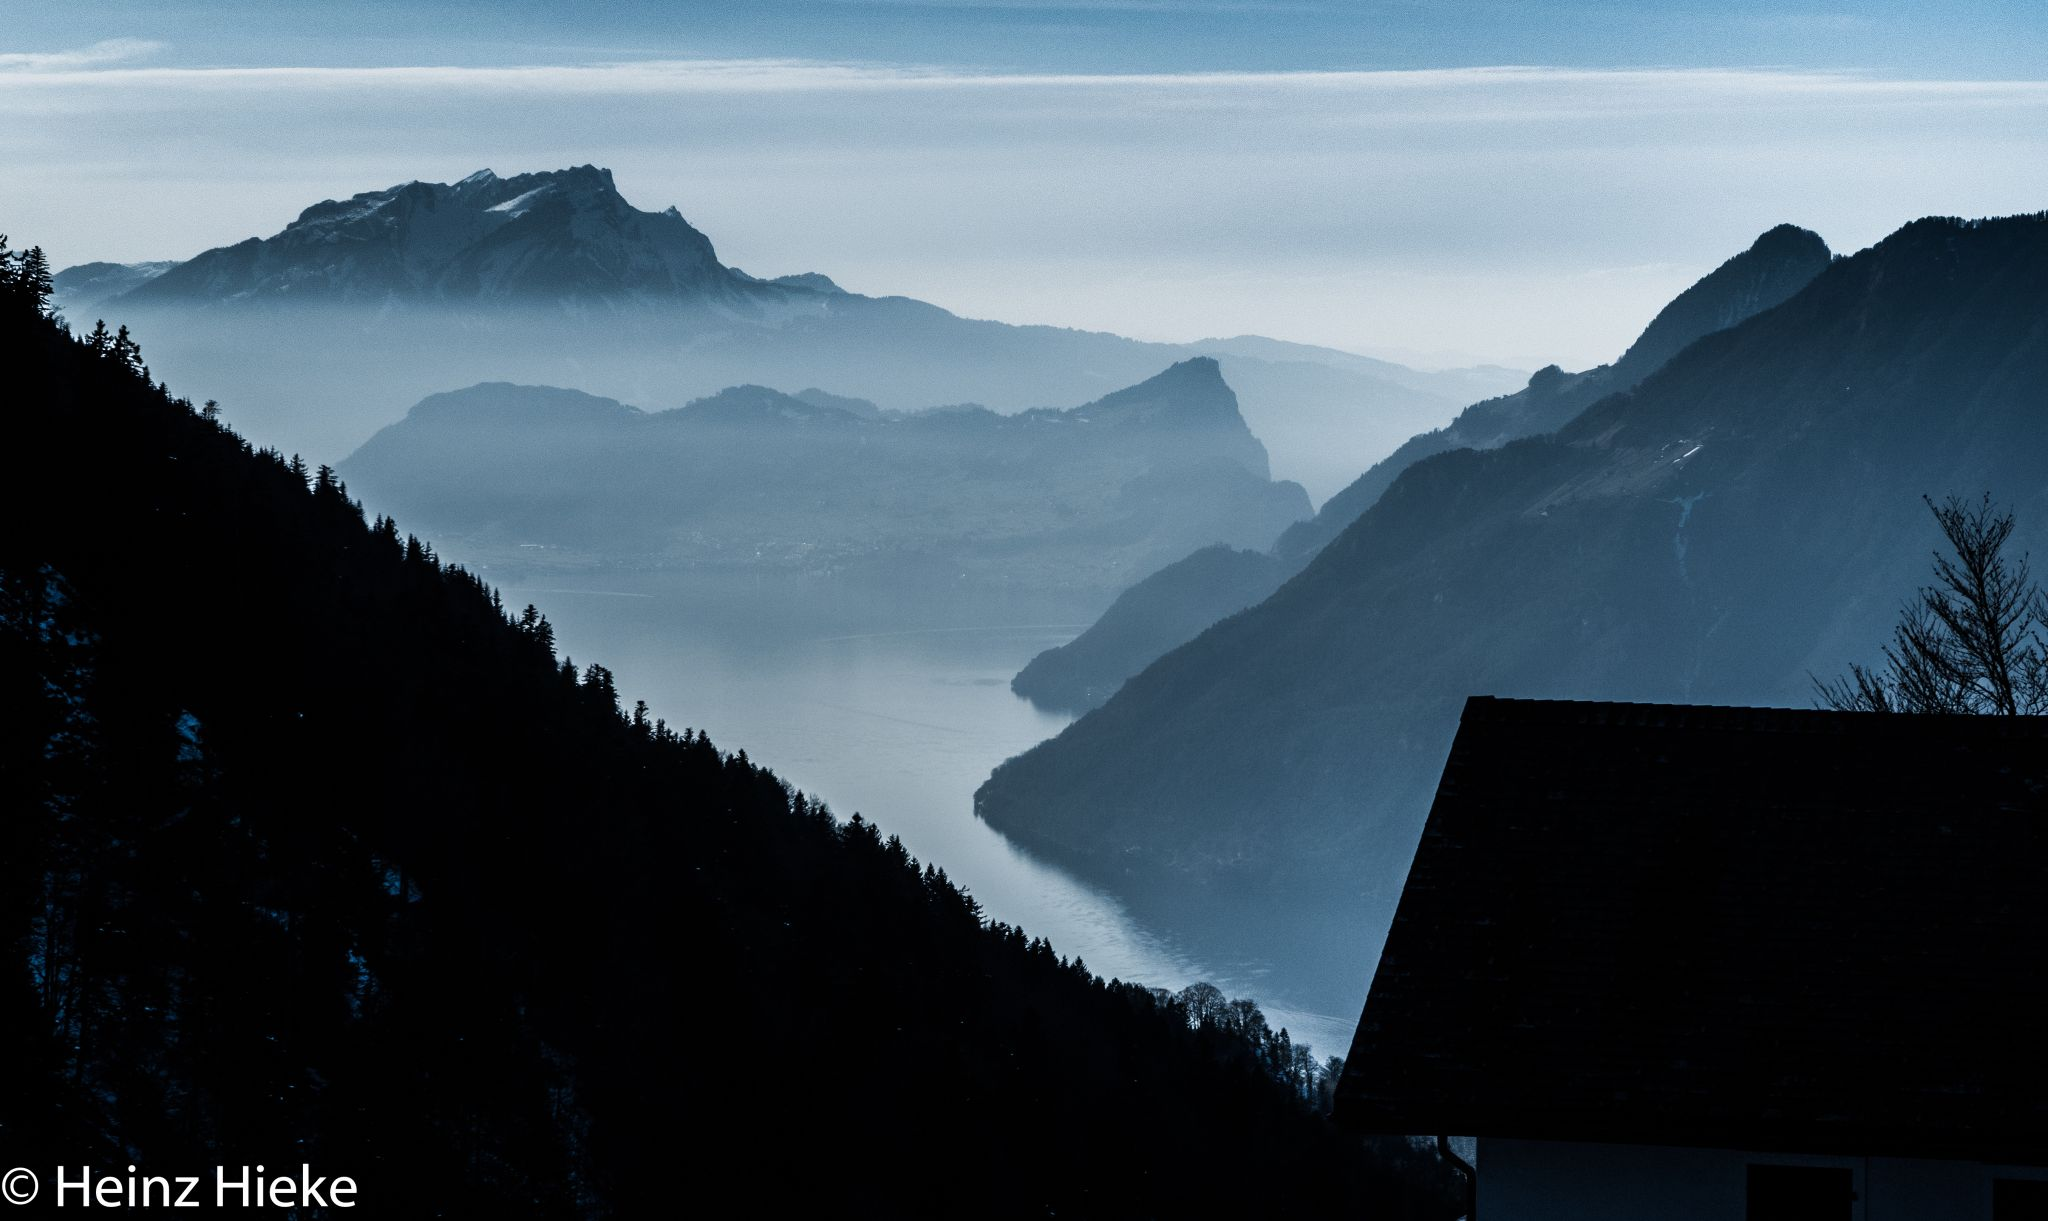 Stoos, Switzerland